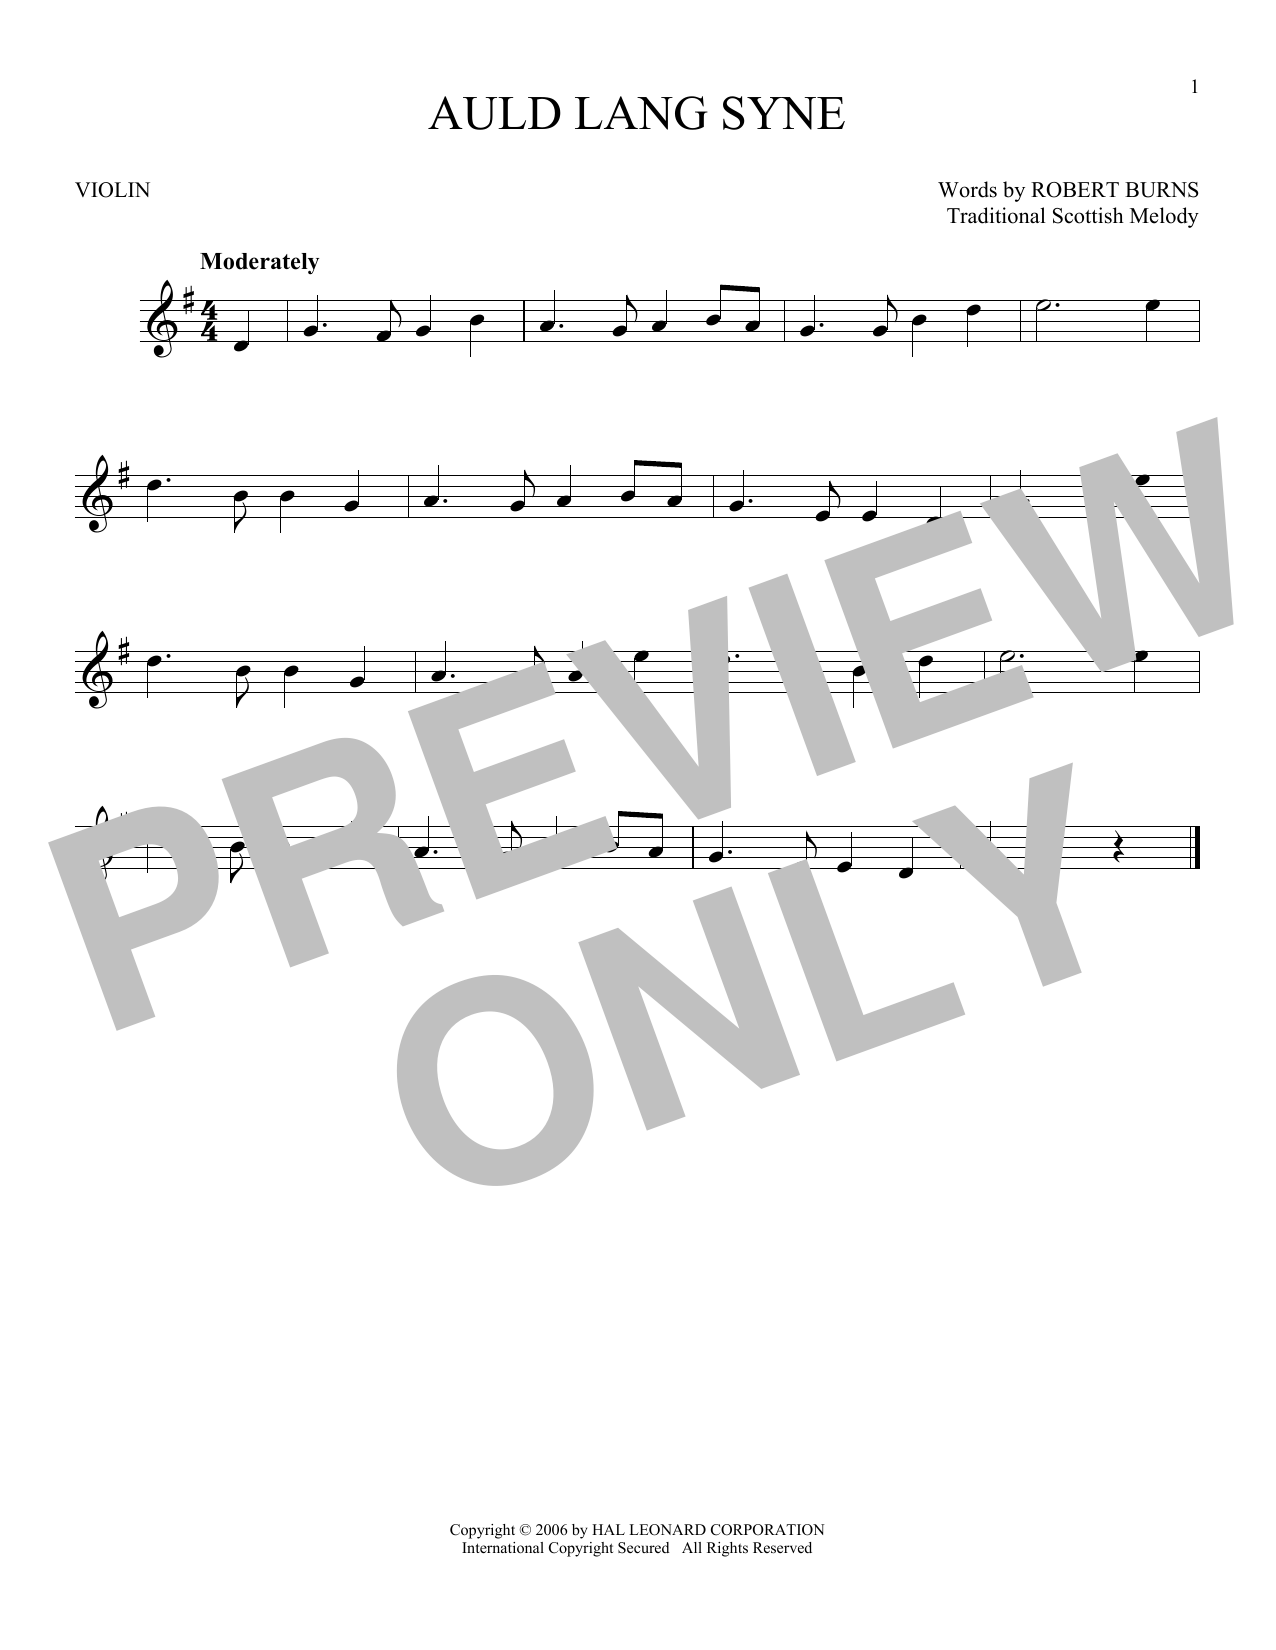 traditional scottish melody